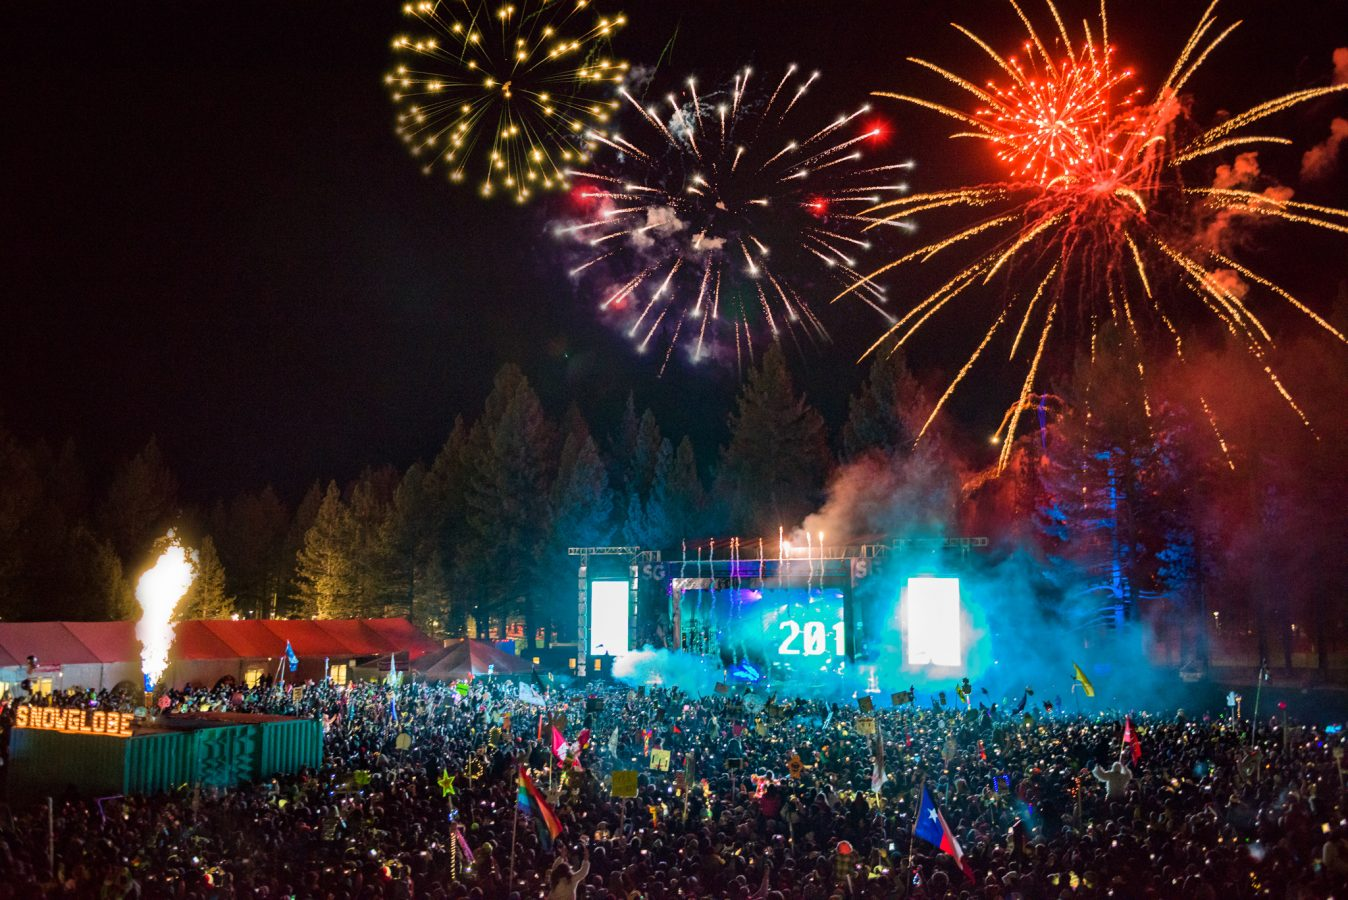 Snow Globe Music Festival